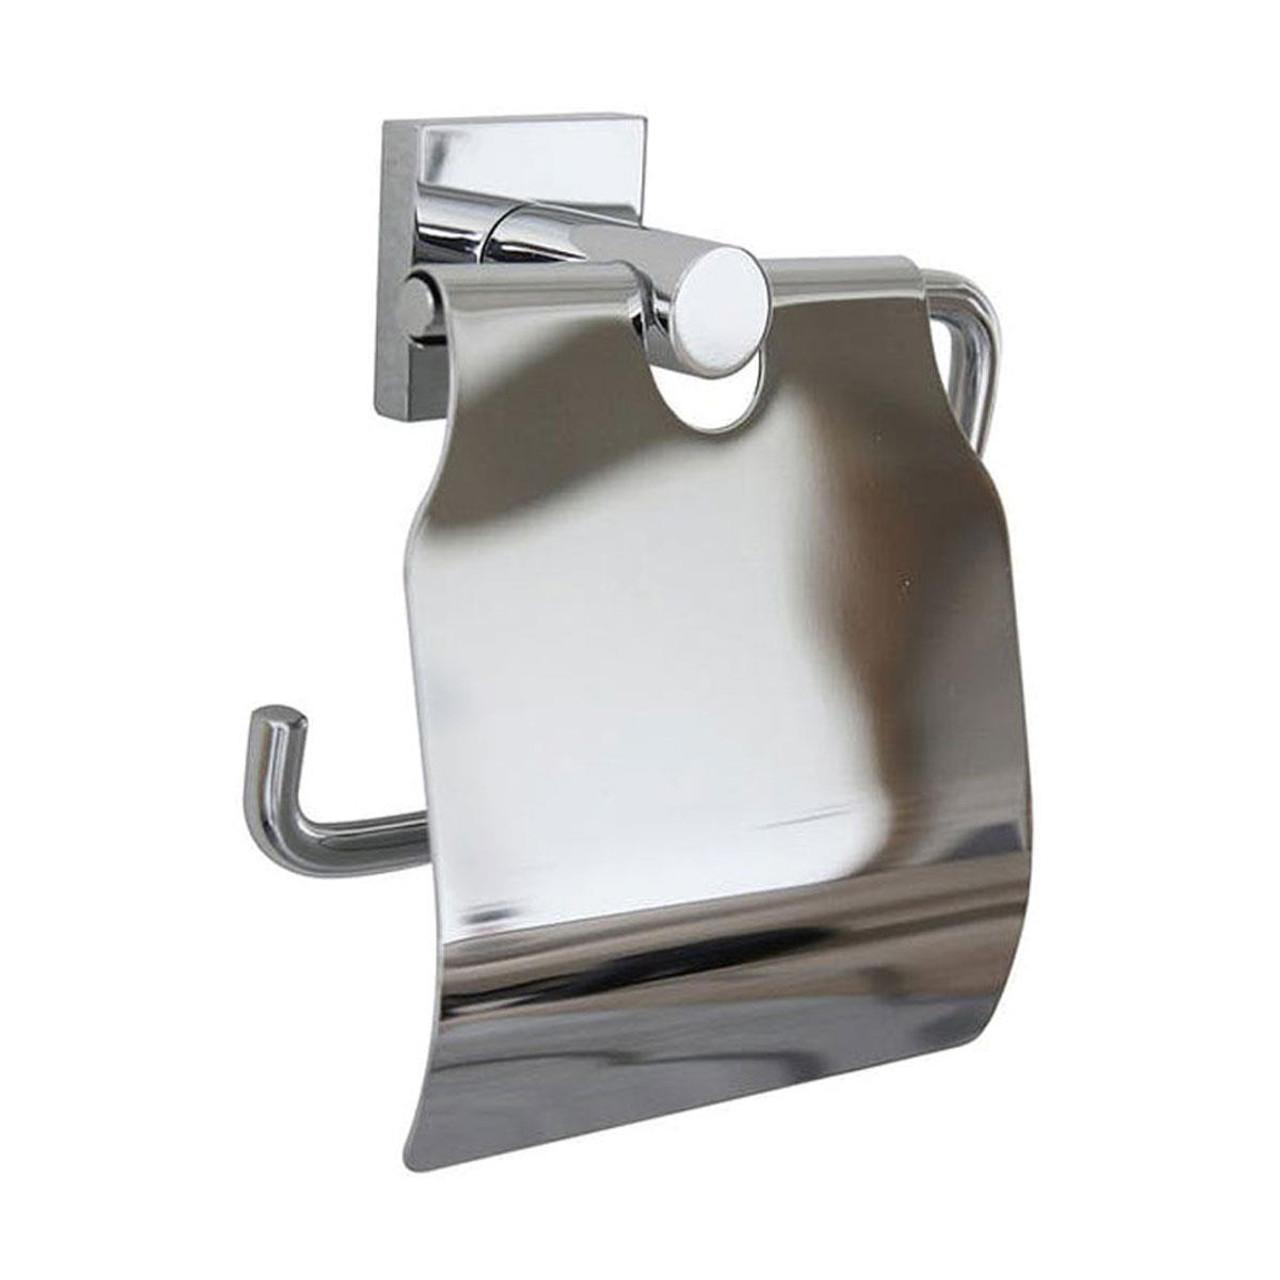 Miller Bond Toilet Roll Holder With Lid